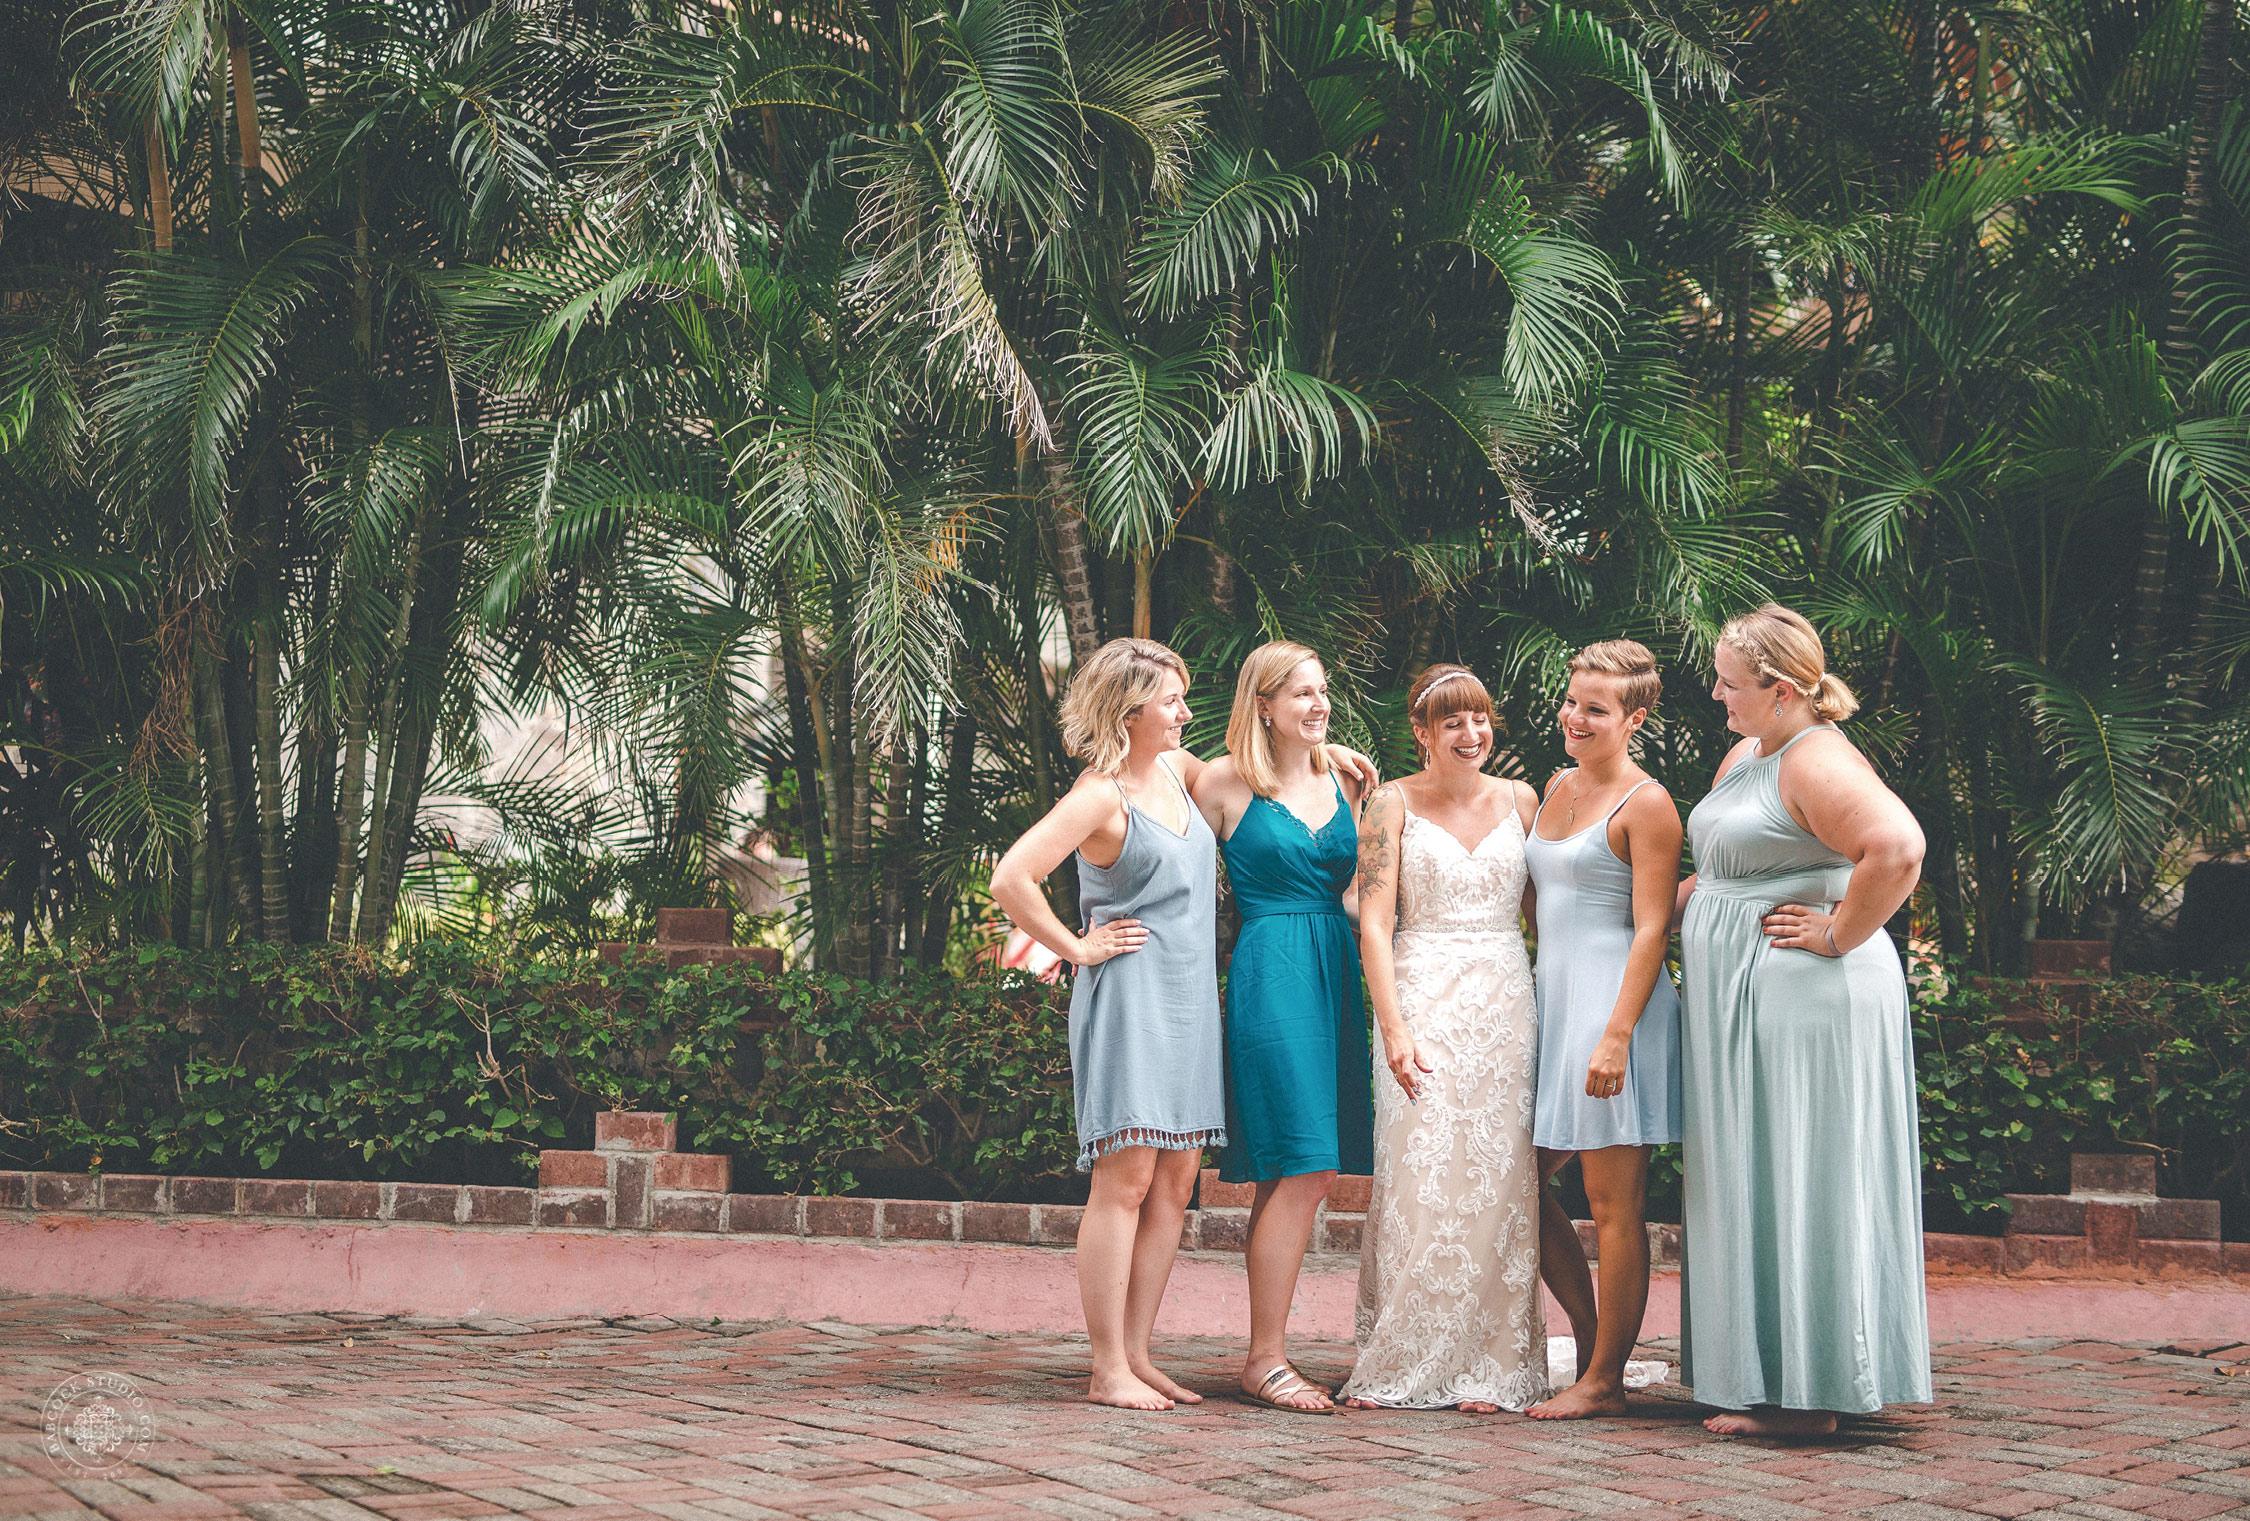 2cat-brandon-costa-rica-destination-wedding-photographer-dayton-ohio-9.jpg